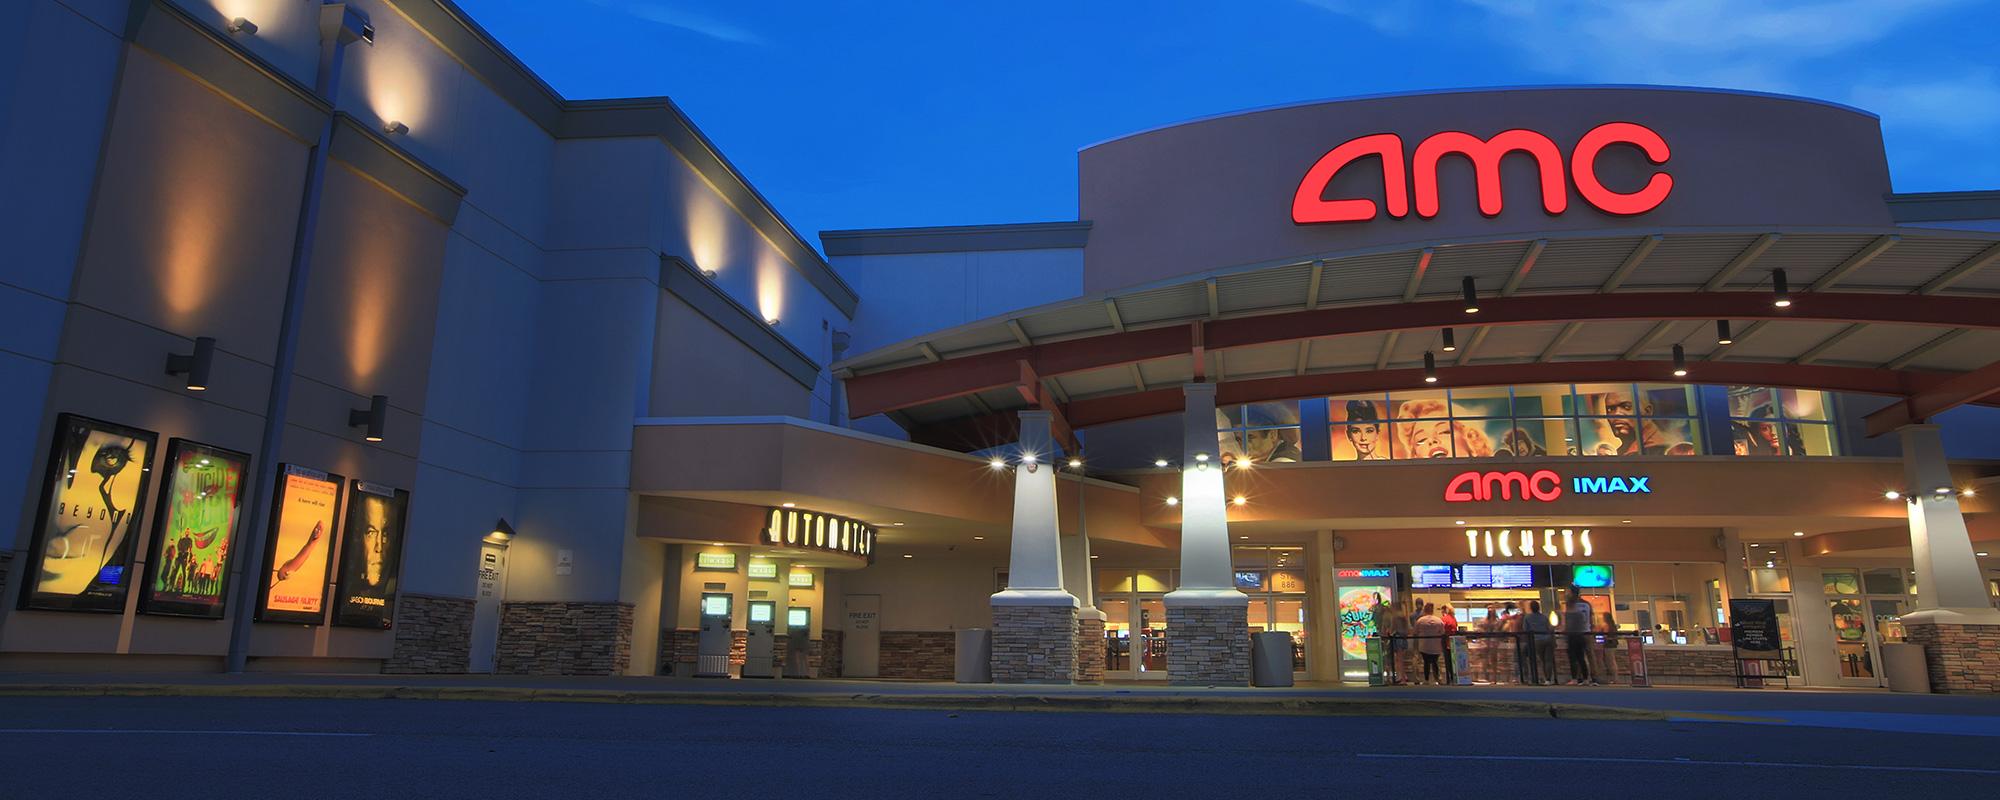 AMC Potomac Mills 18 - Woodbridge, Virginia 22192 - AMC Theatres